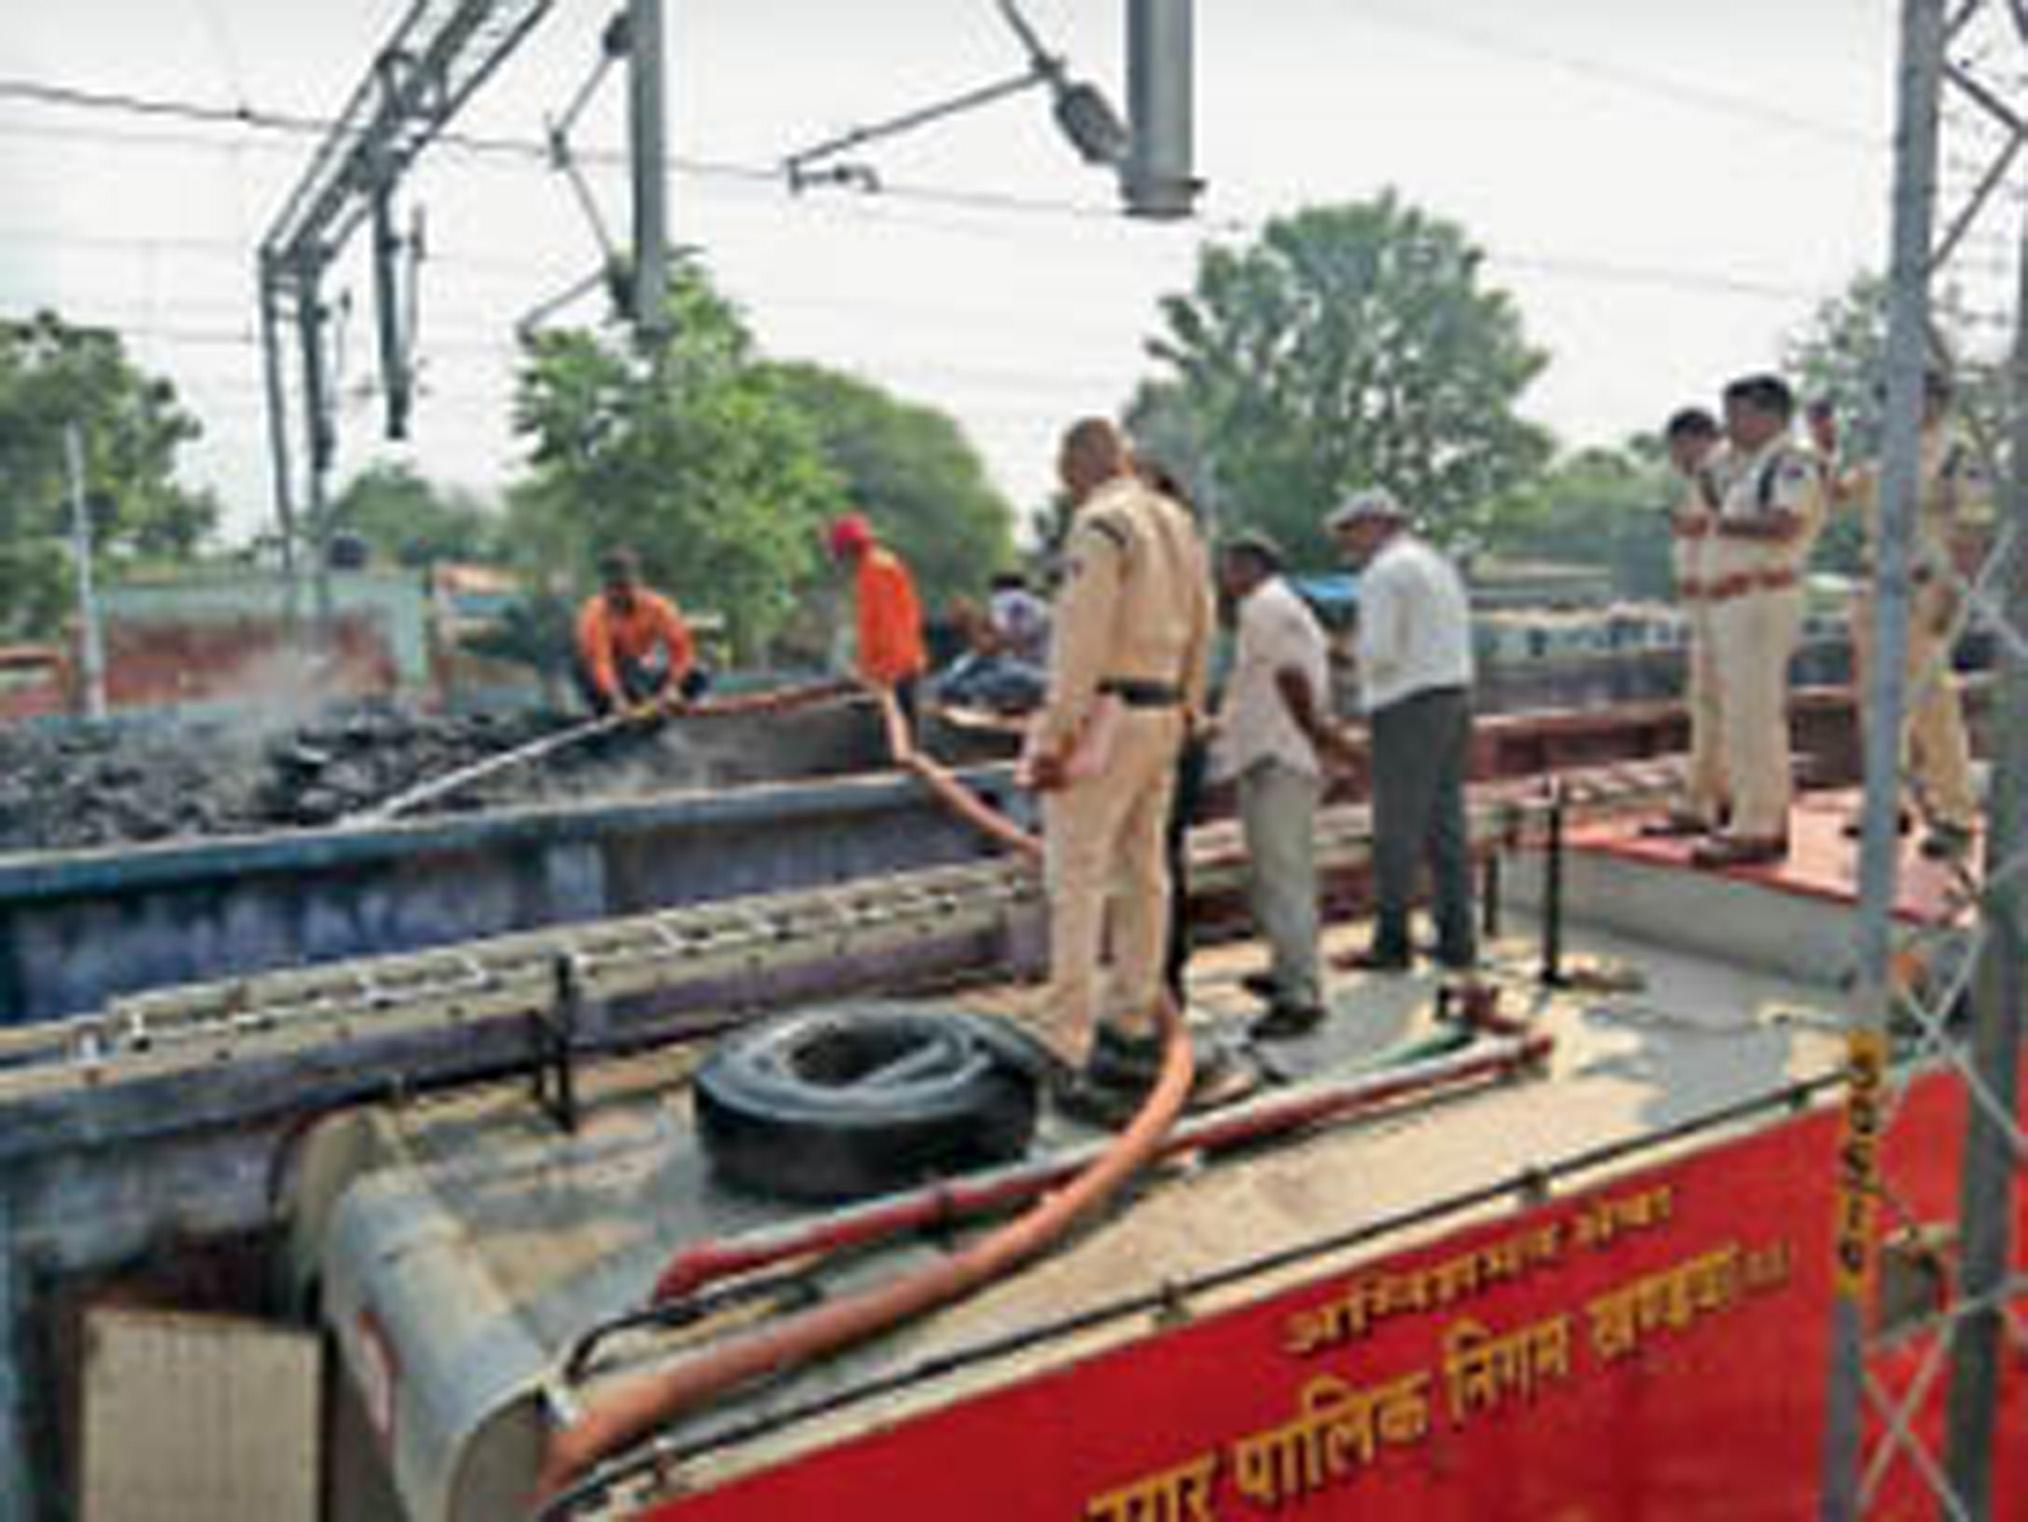 कोयला ले जा रही मालगाड़ी से उठा धुआं, बुझाई आग|खंडवा,Khandwa - Dainik Bhaskar